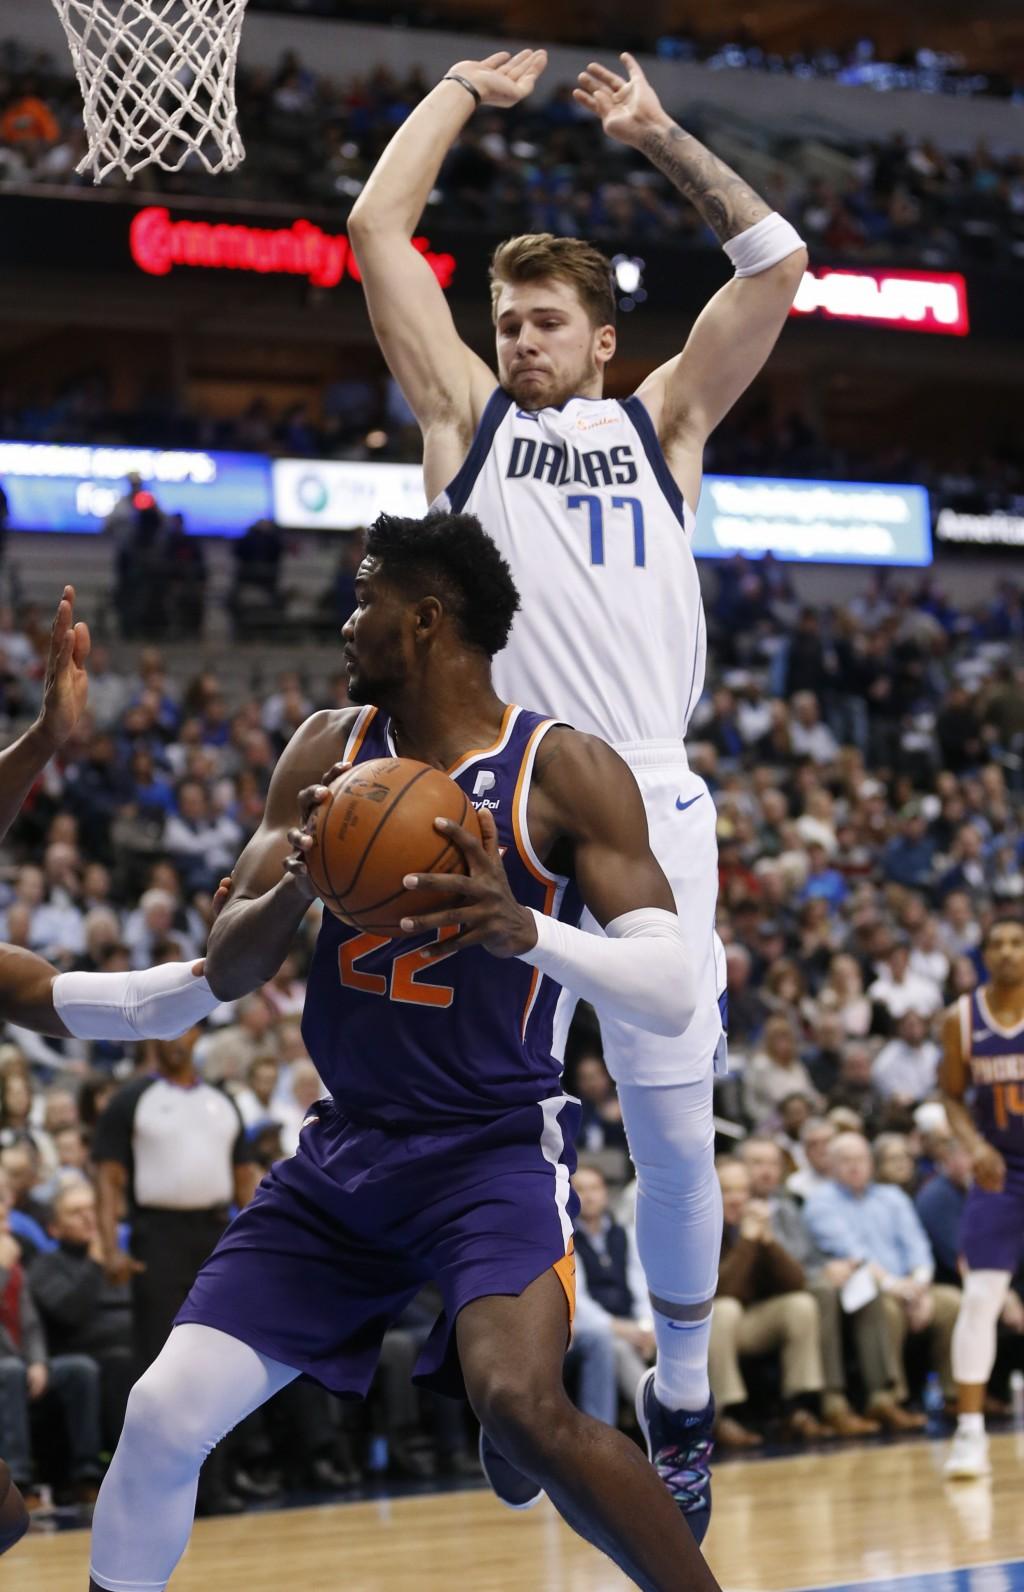 Phoenix Suns center Deandre Ayton (22) looks to shoot as Dallas Mavericks forward Luka Doncic (77) guards during the first half of an NBA basketball g